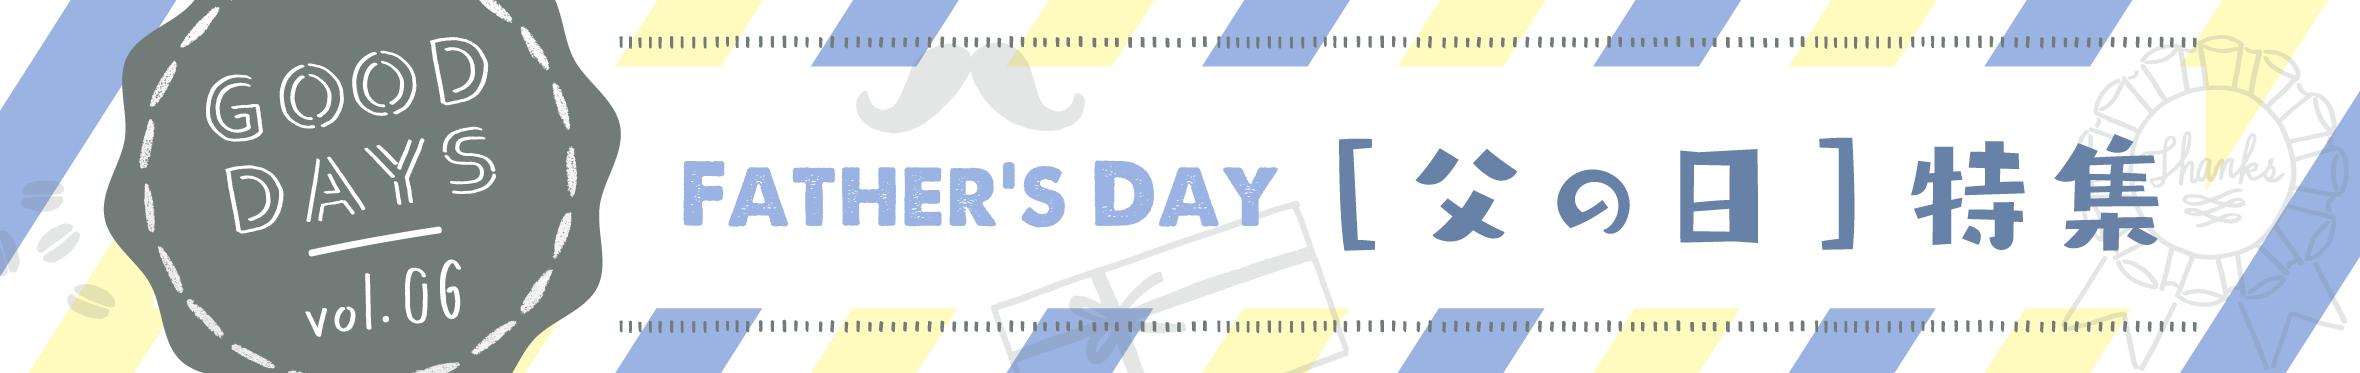 GOOD DAYS Vol.6 FATHER'S DAY [父の日]特集